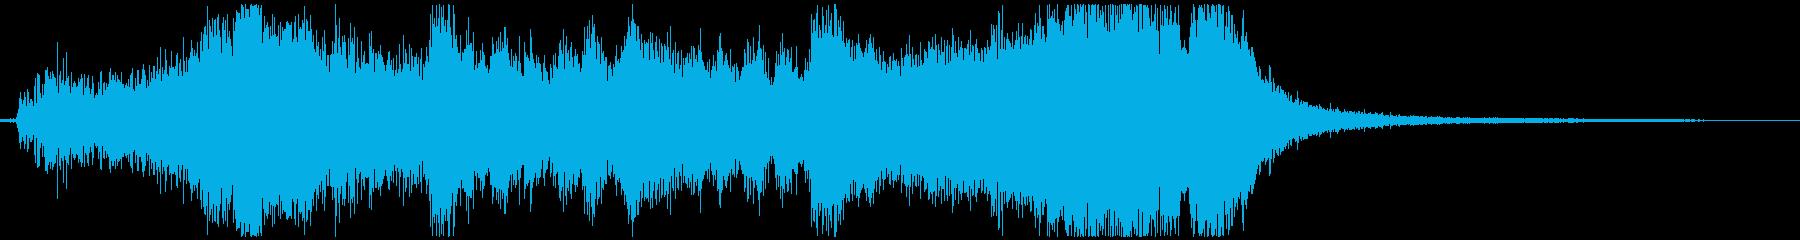 Magnificent Fanfareの再生済みの波形